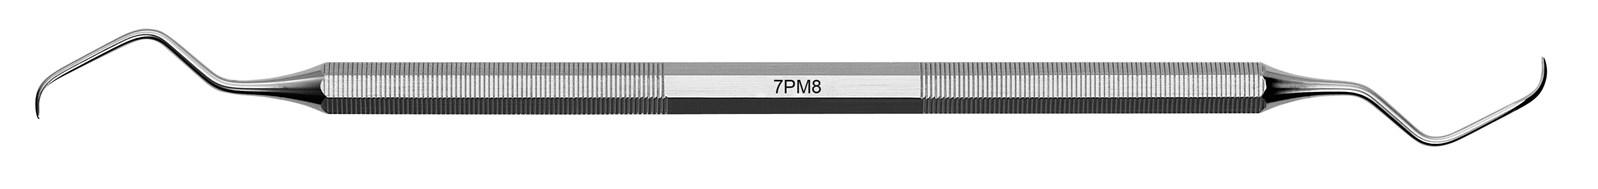 Kyreta Gracey Mini - 7PM8, ADEP červený